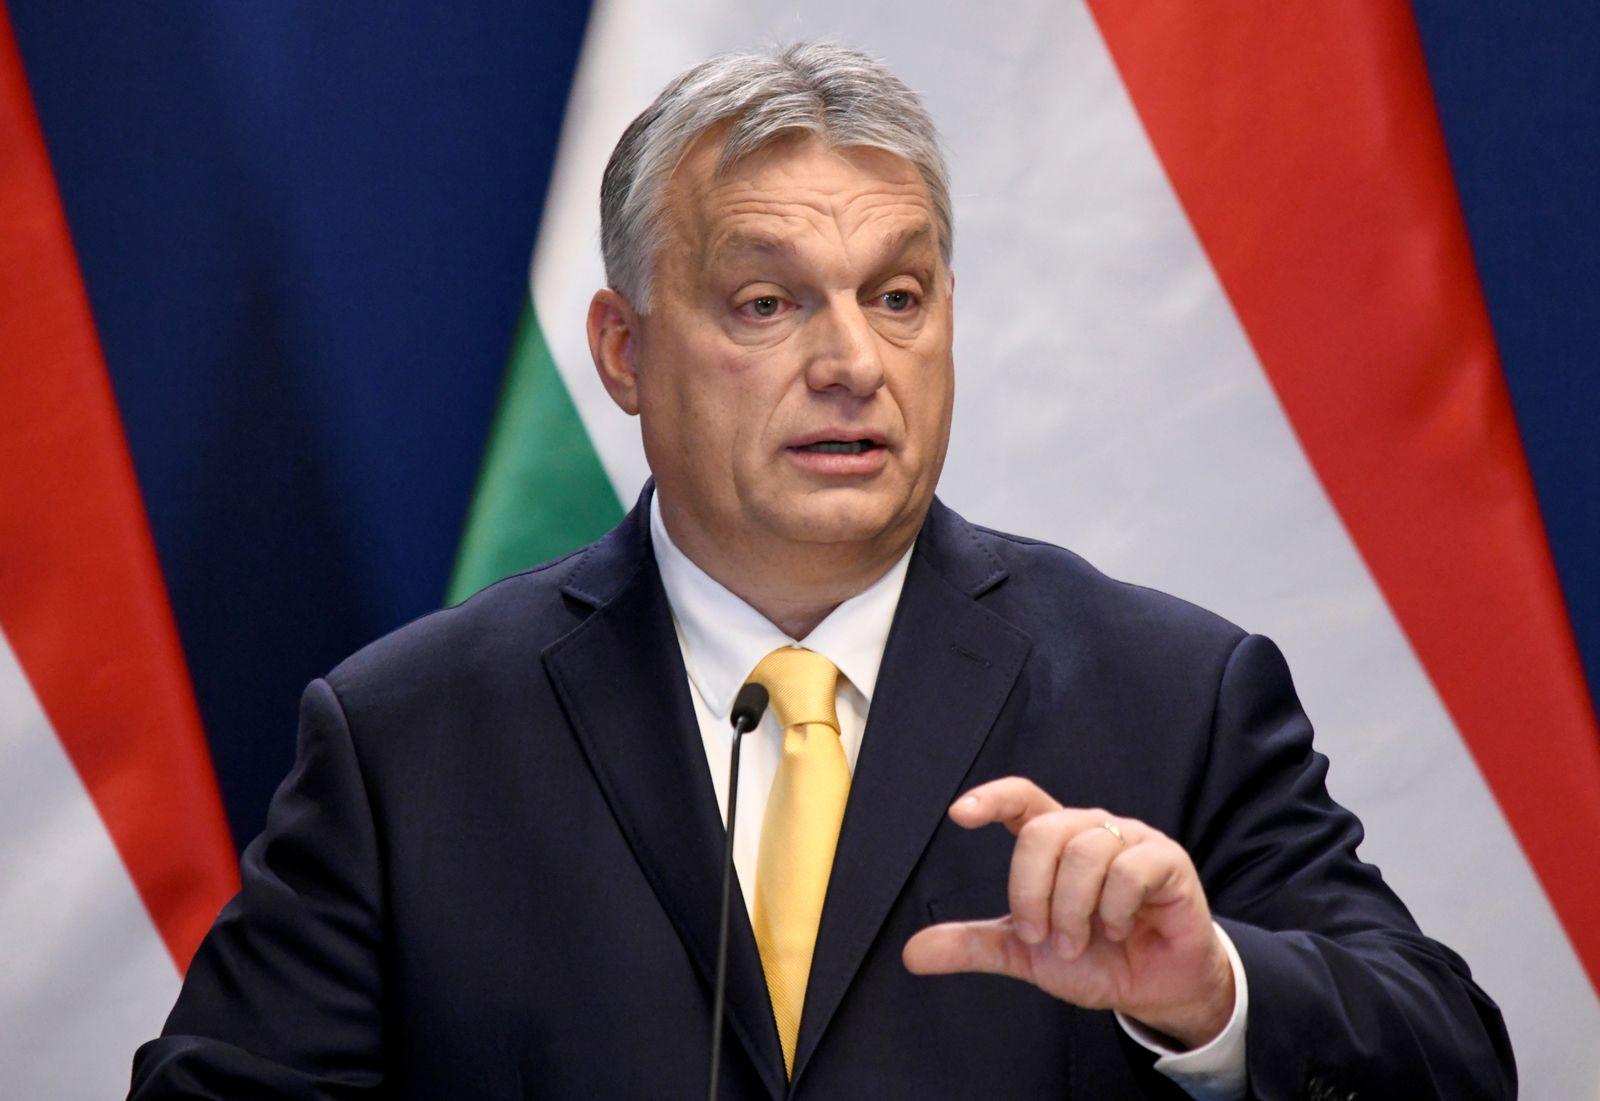 Hungarian Prime Minister Viktor Orban holds an international news conference in Budapest